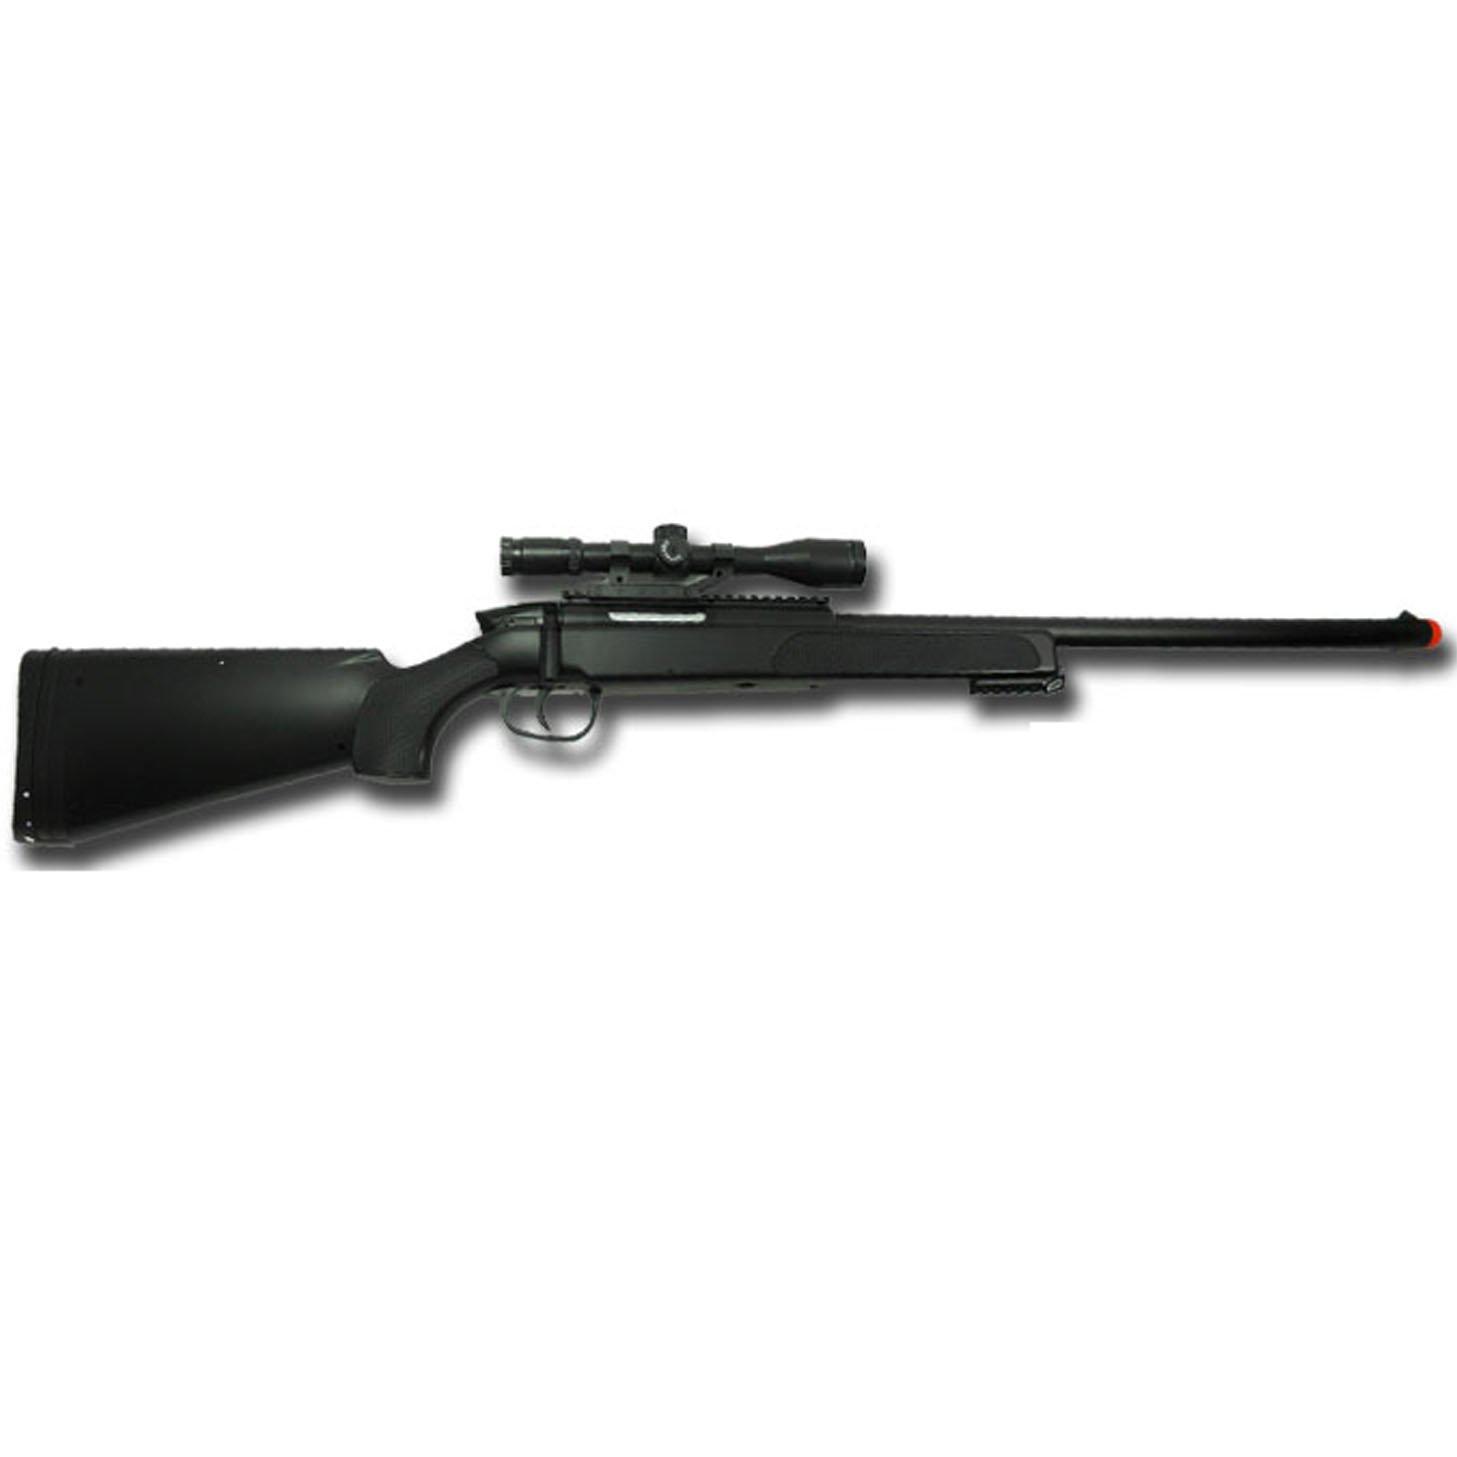 SWISS ARMS FUCILE A MOLLA M6 FIREPOWER BLACK EAGLE + FINTA OTTICA SOFTAIR